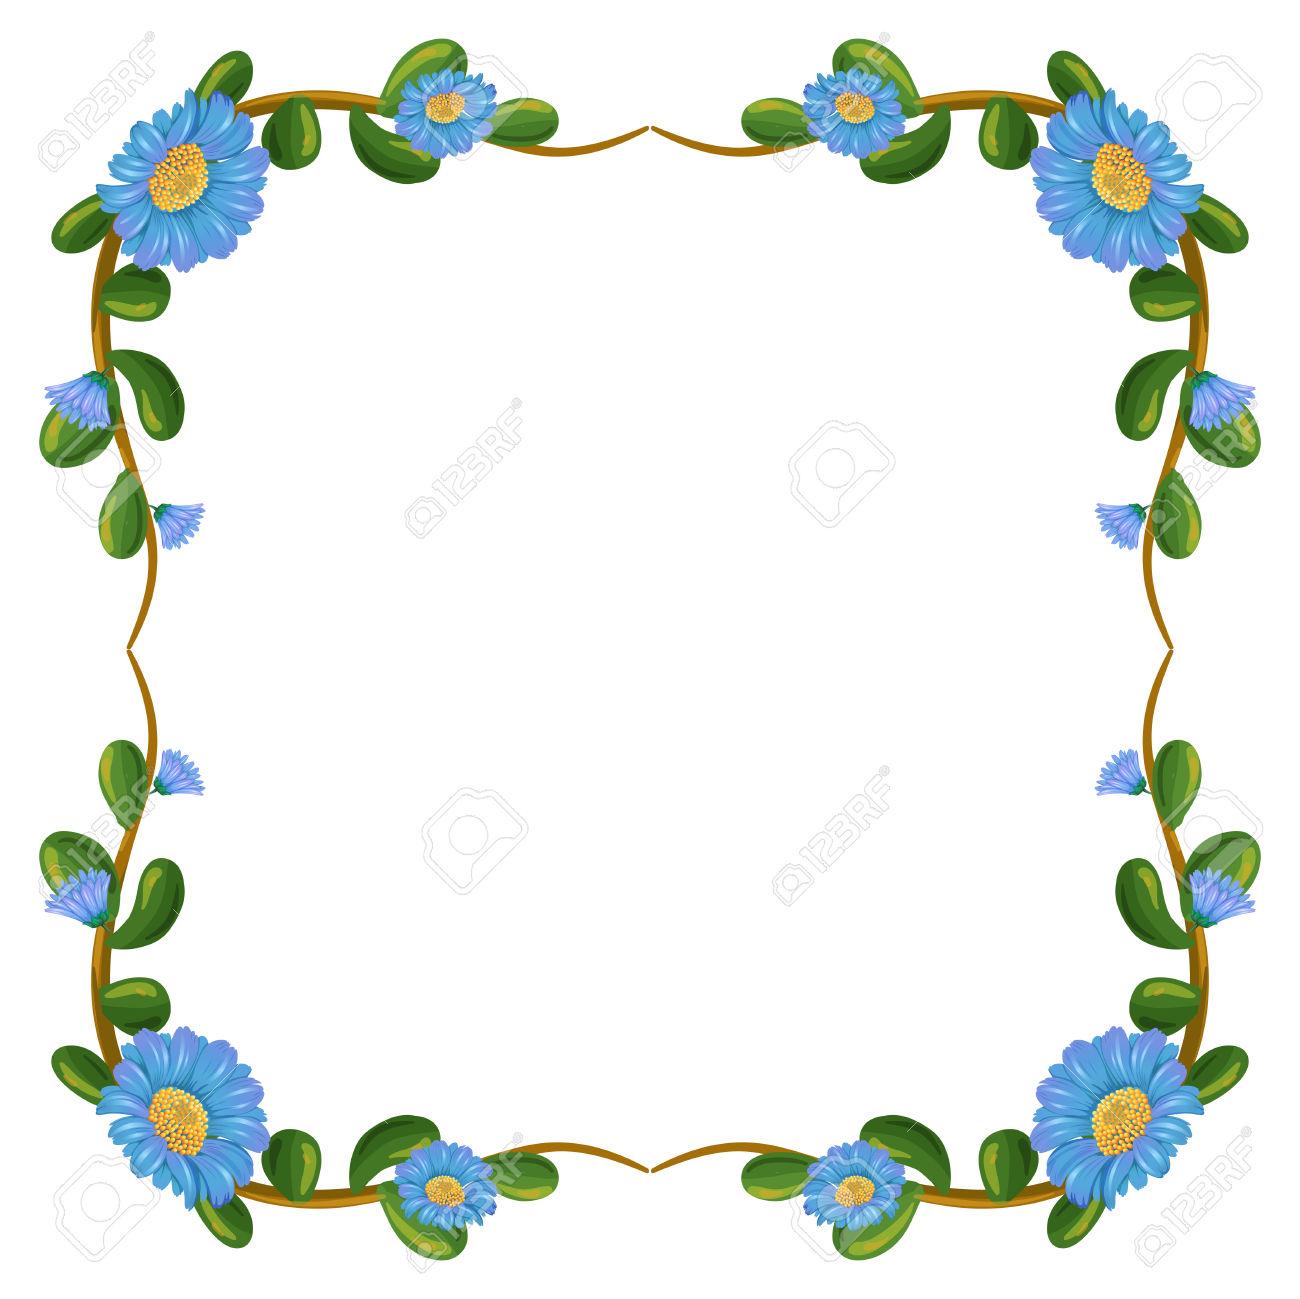 Blue flower border for word flowers ideas the 25 best border design ideas on pinterest vine borders list of synonyms and antonyms of the word margin design purple flowers border izmirmasajfo Gallery